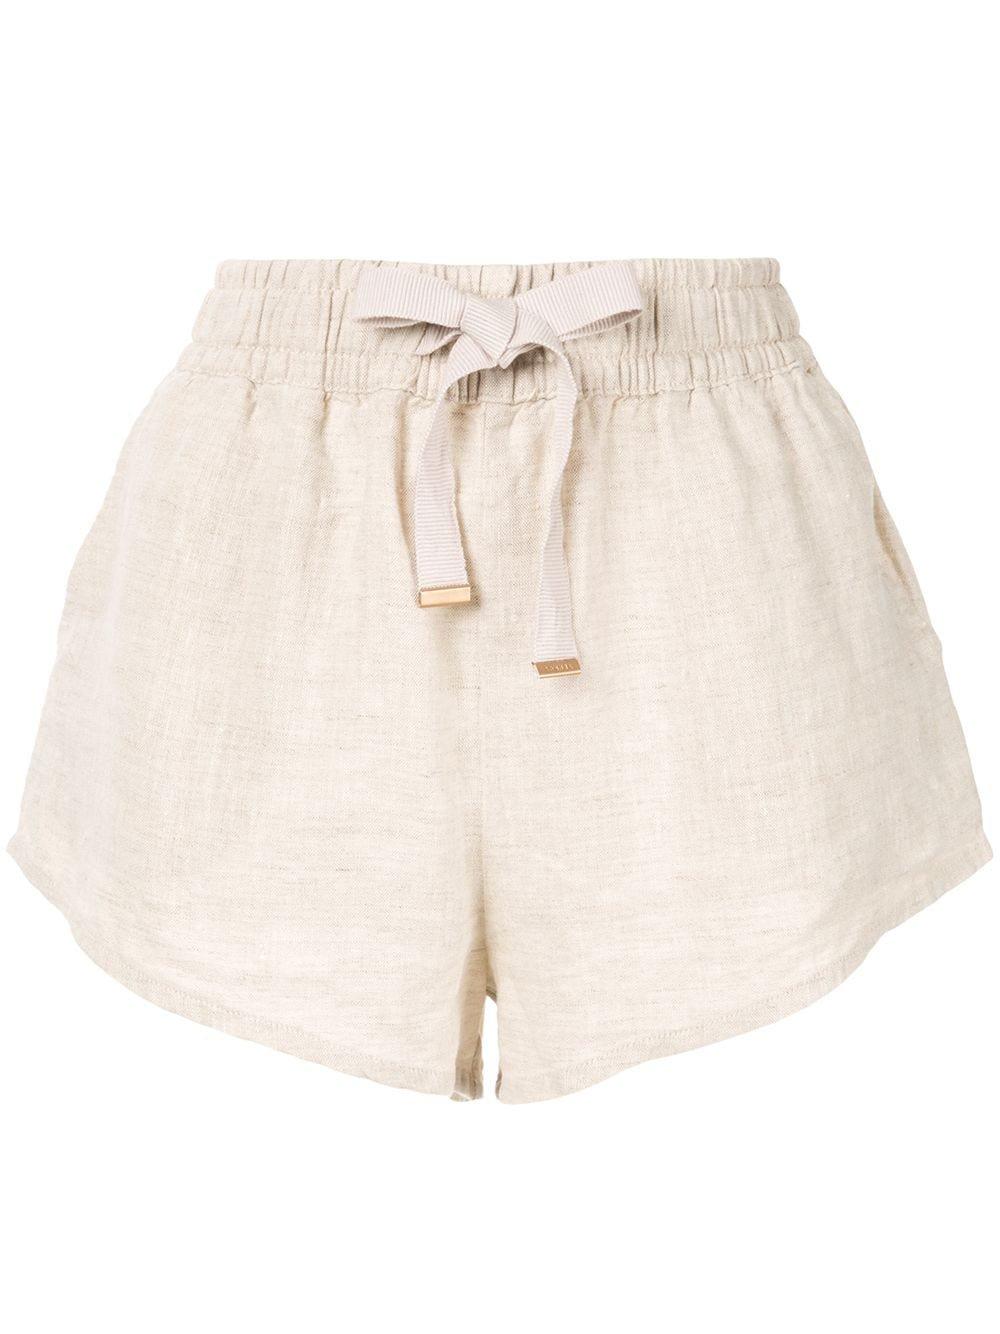 Venroy Drawstring Shorts - Farfetch